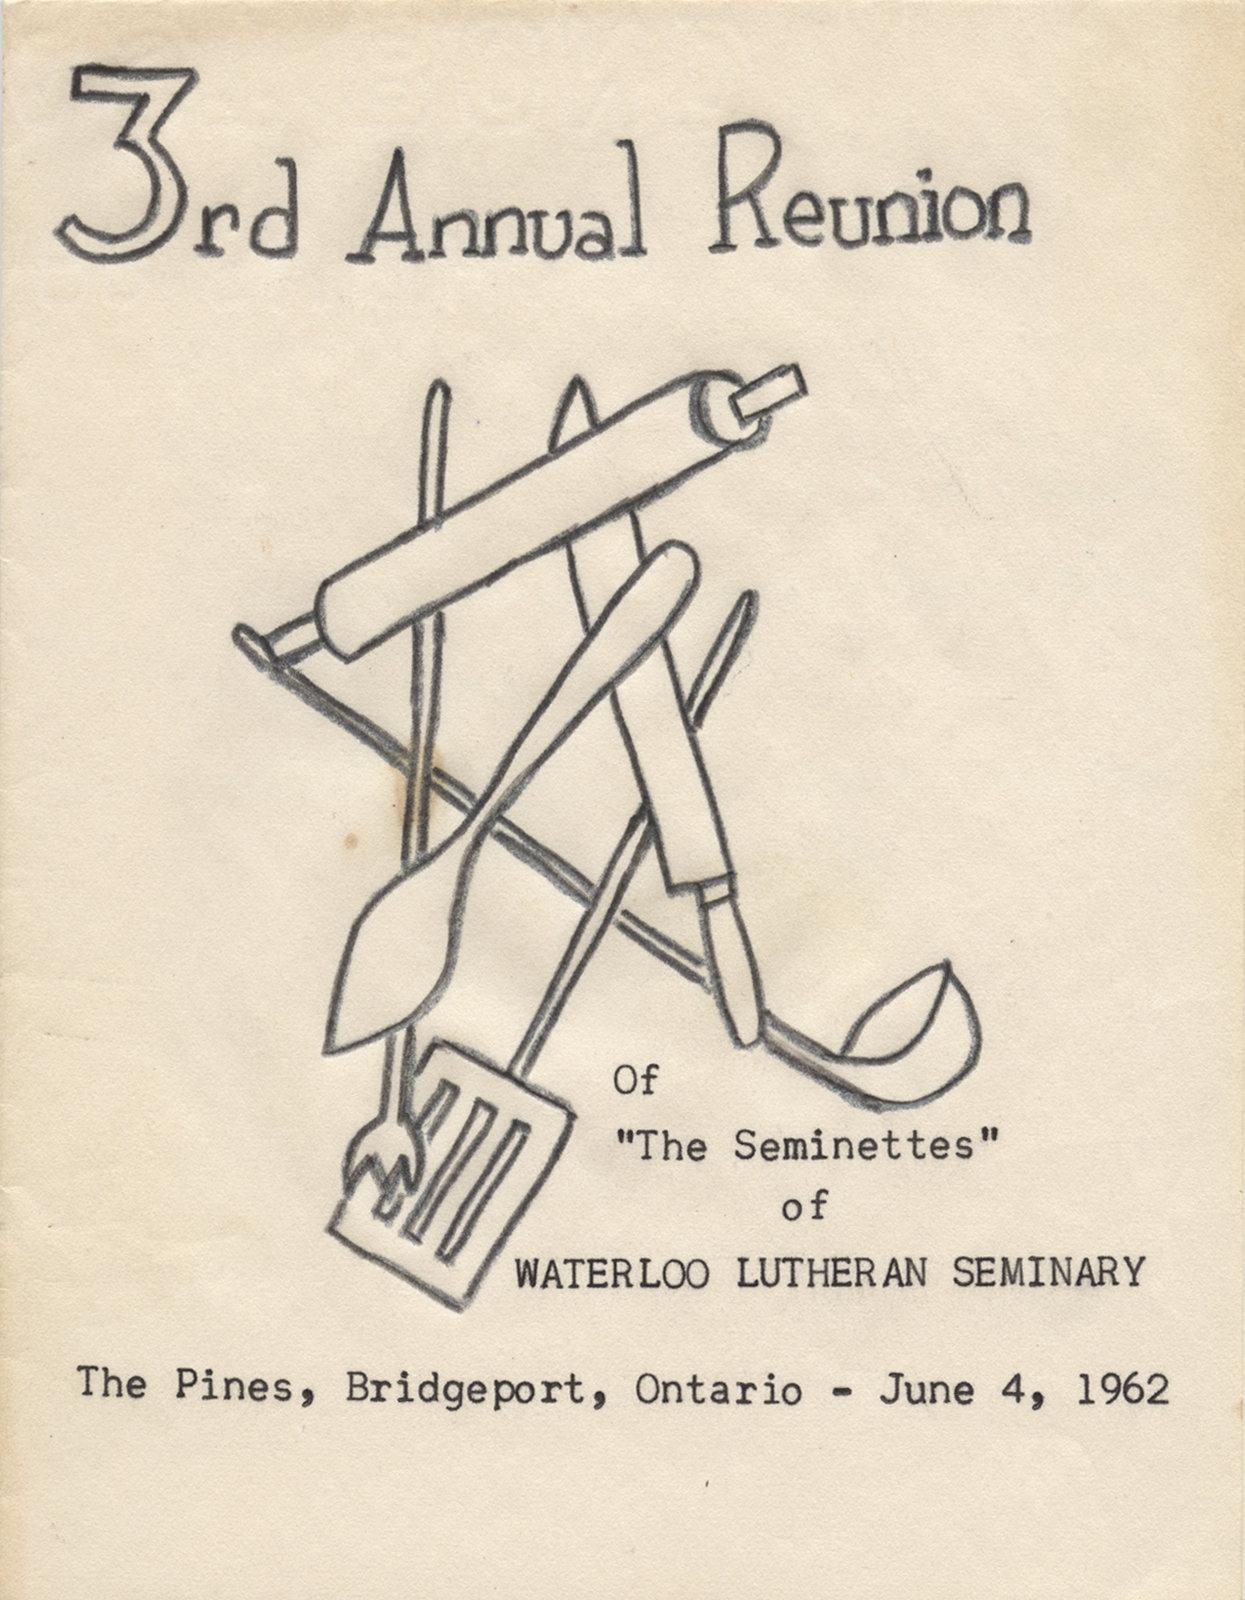 Seminette Club third annual reunion program, 1962